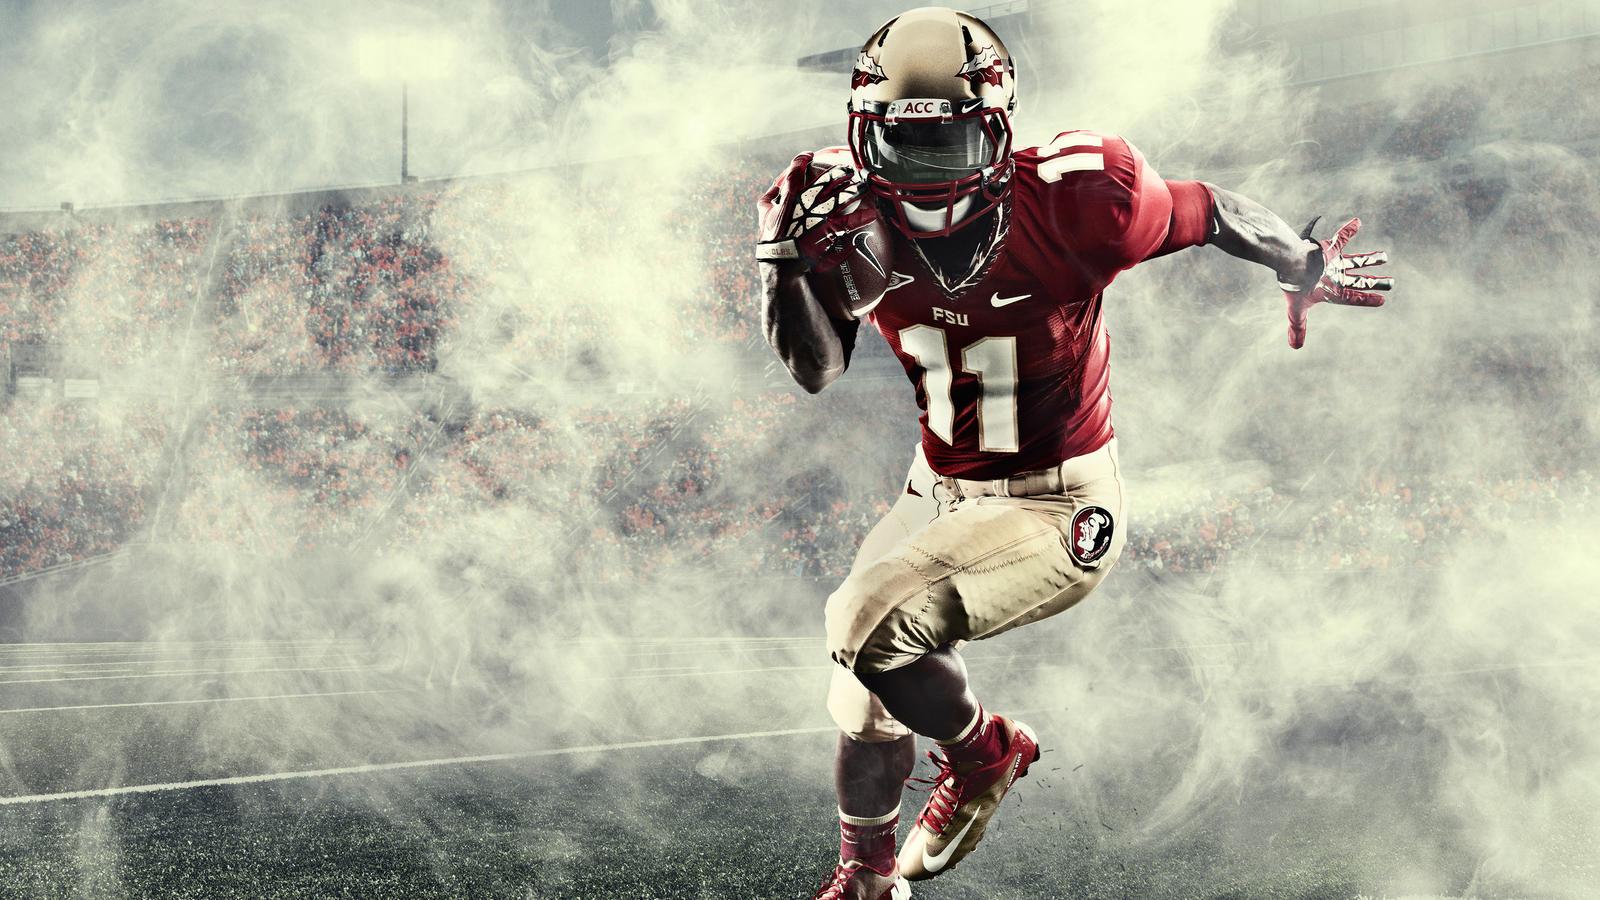 Nike News - Seminoles, Trojans kick off college football season in new Nike cleats and gloves